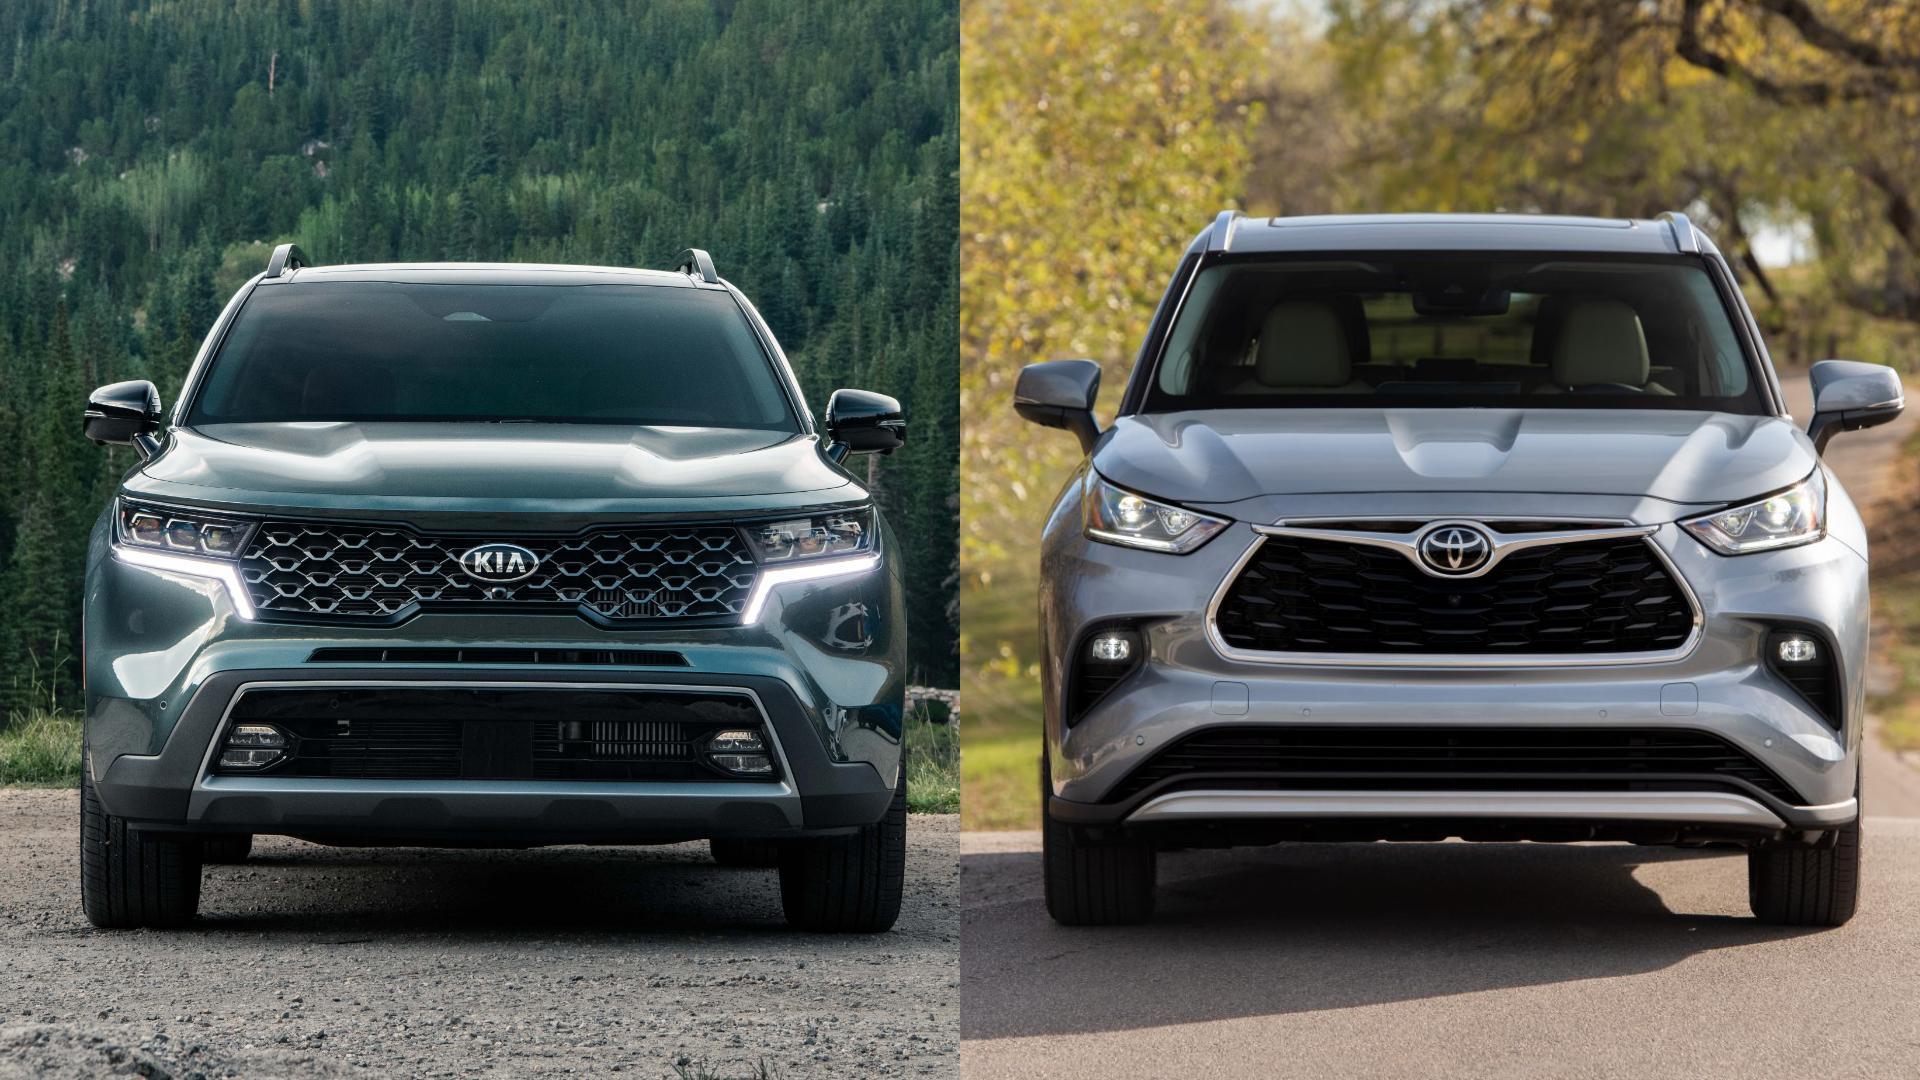 Kia Sorento vs Toyota Highlander: Does the new Kia challenge Toyota's throne?